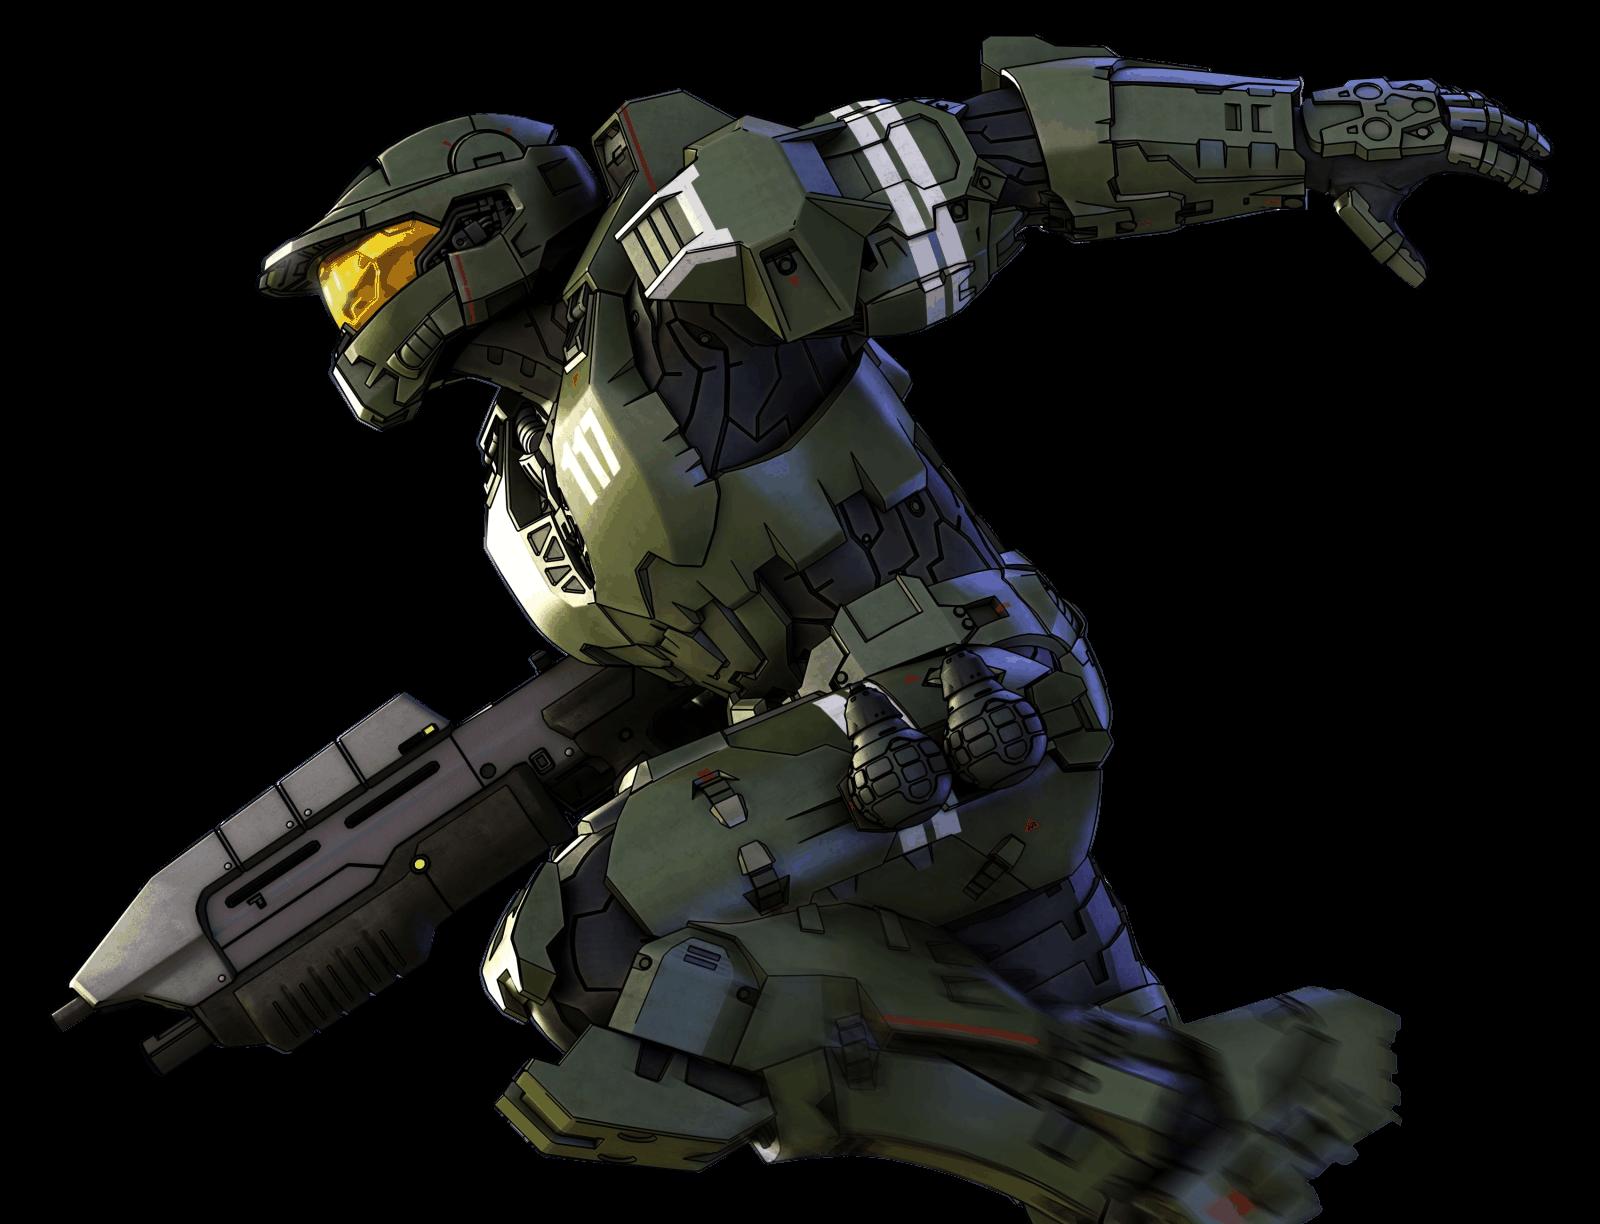 Halo_Legends_Spartan png